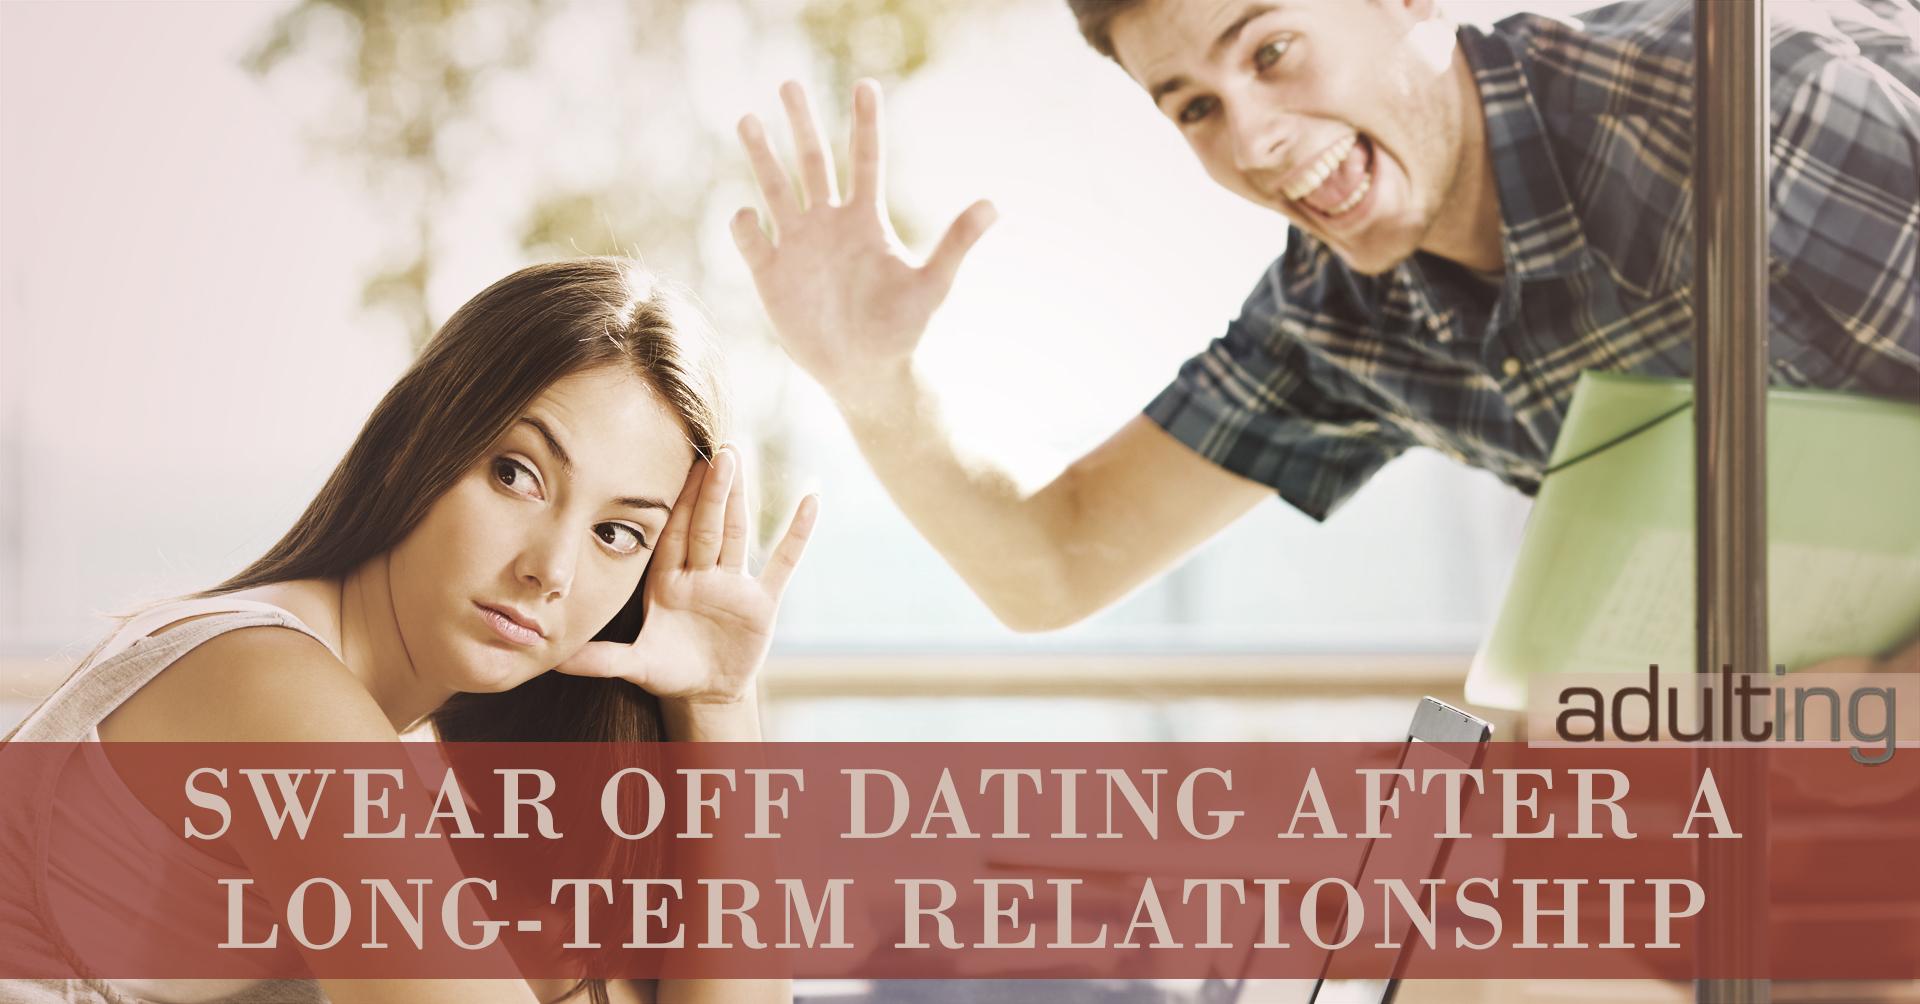 Christian long term dating